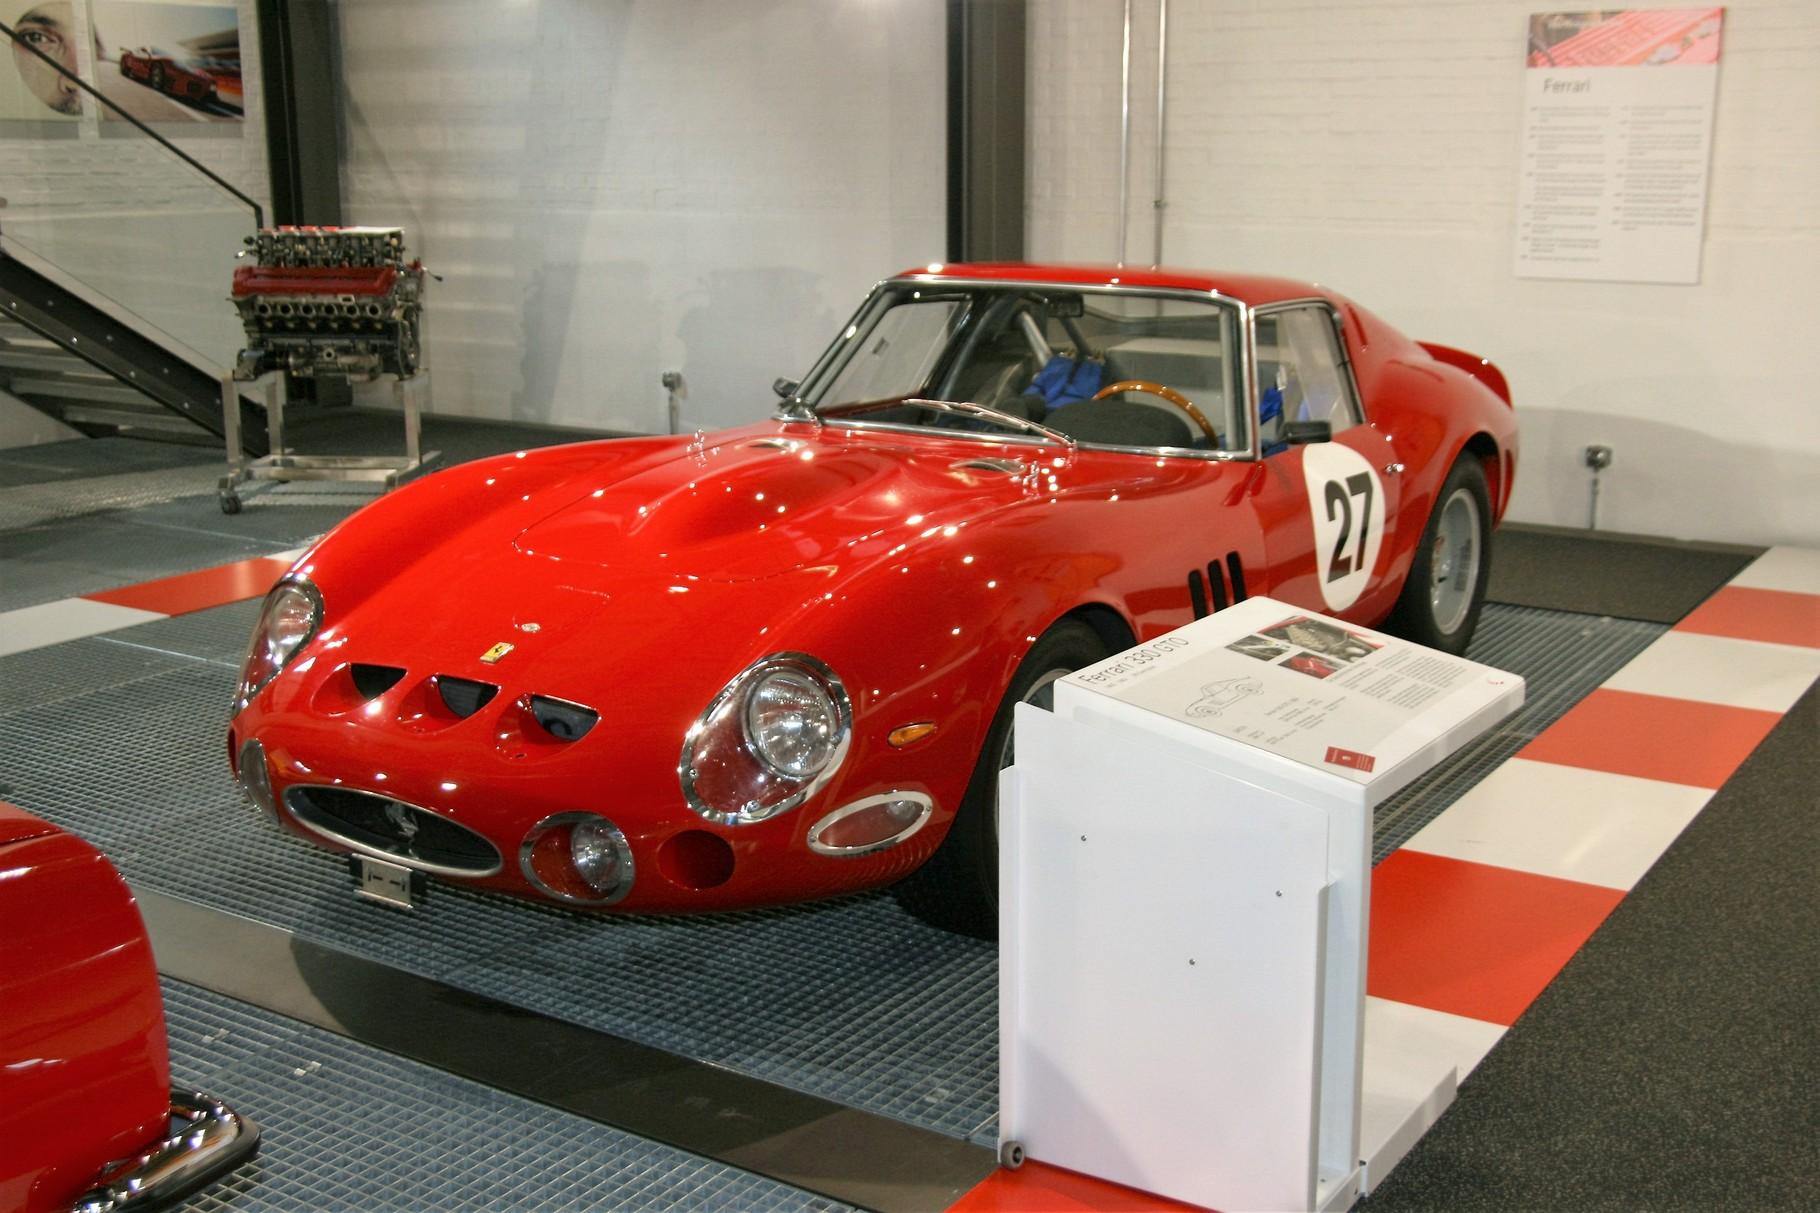 der sehr teure Ferrari